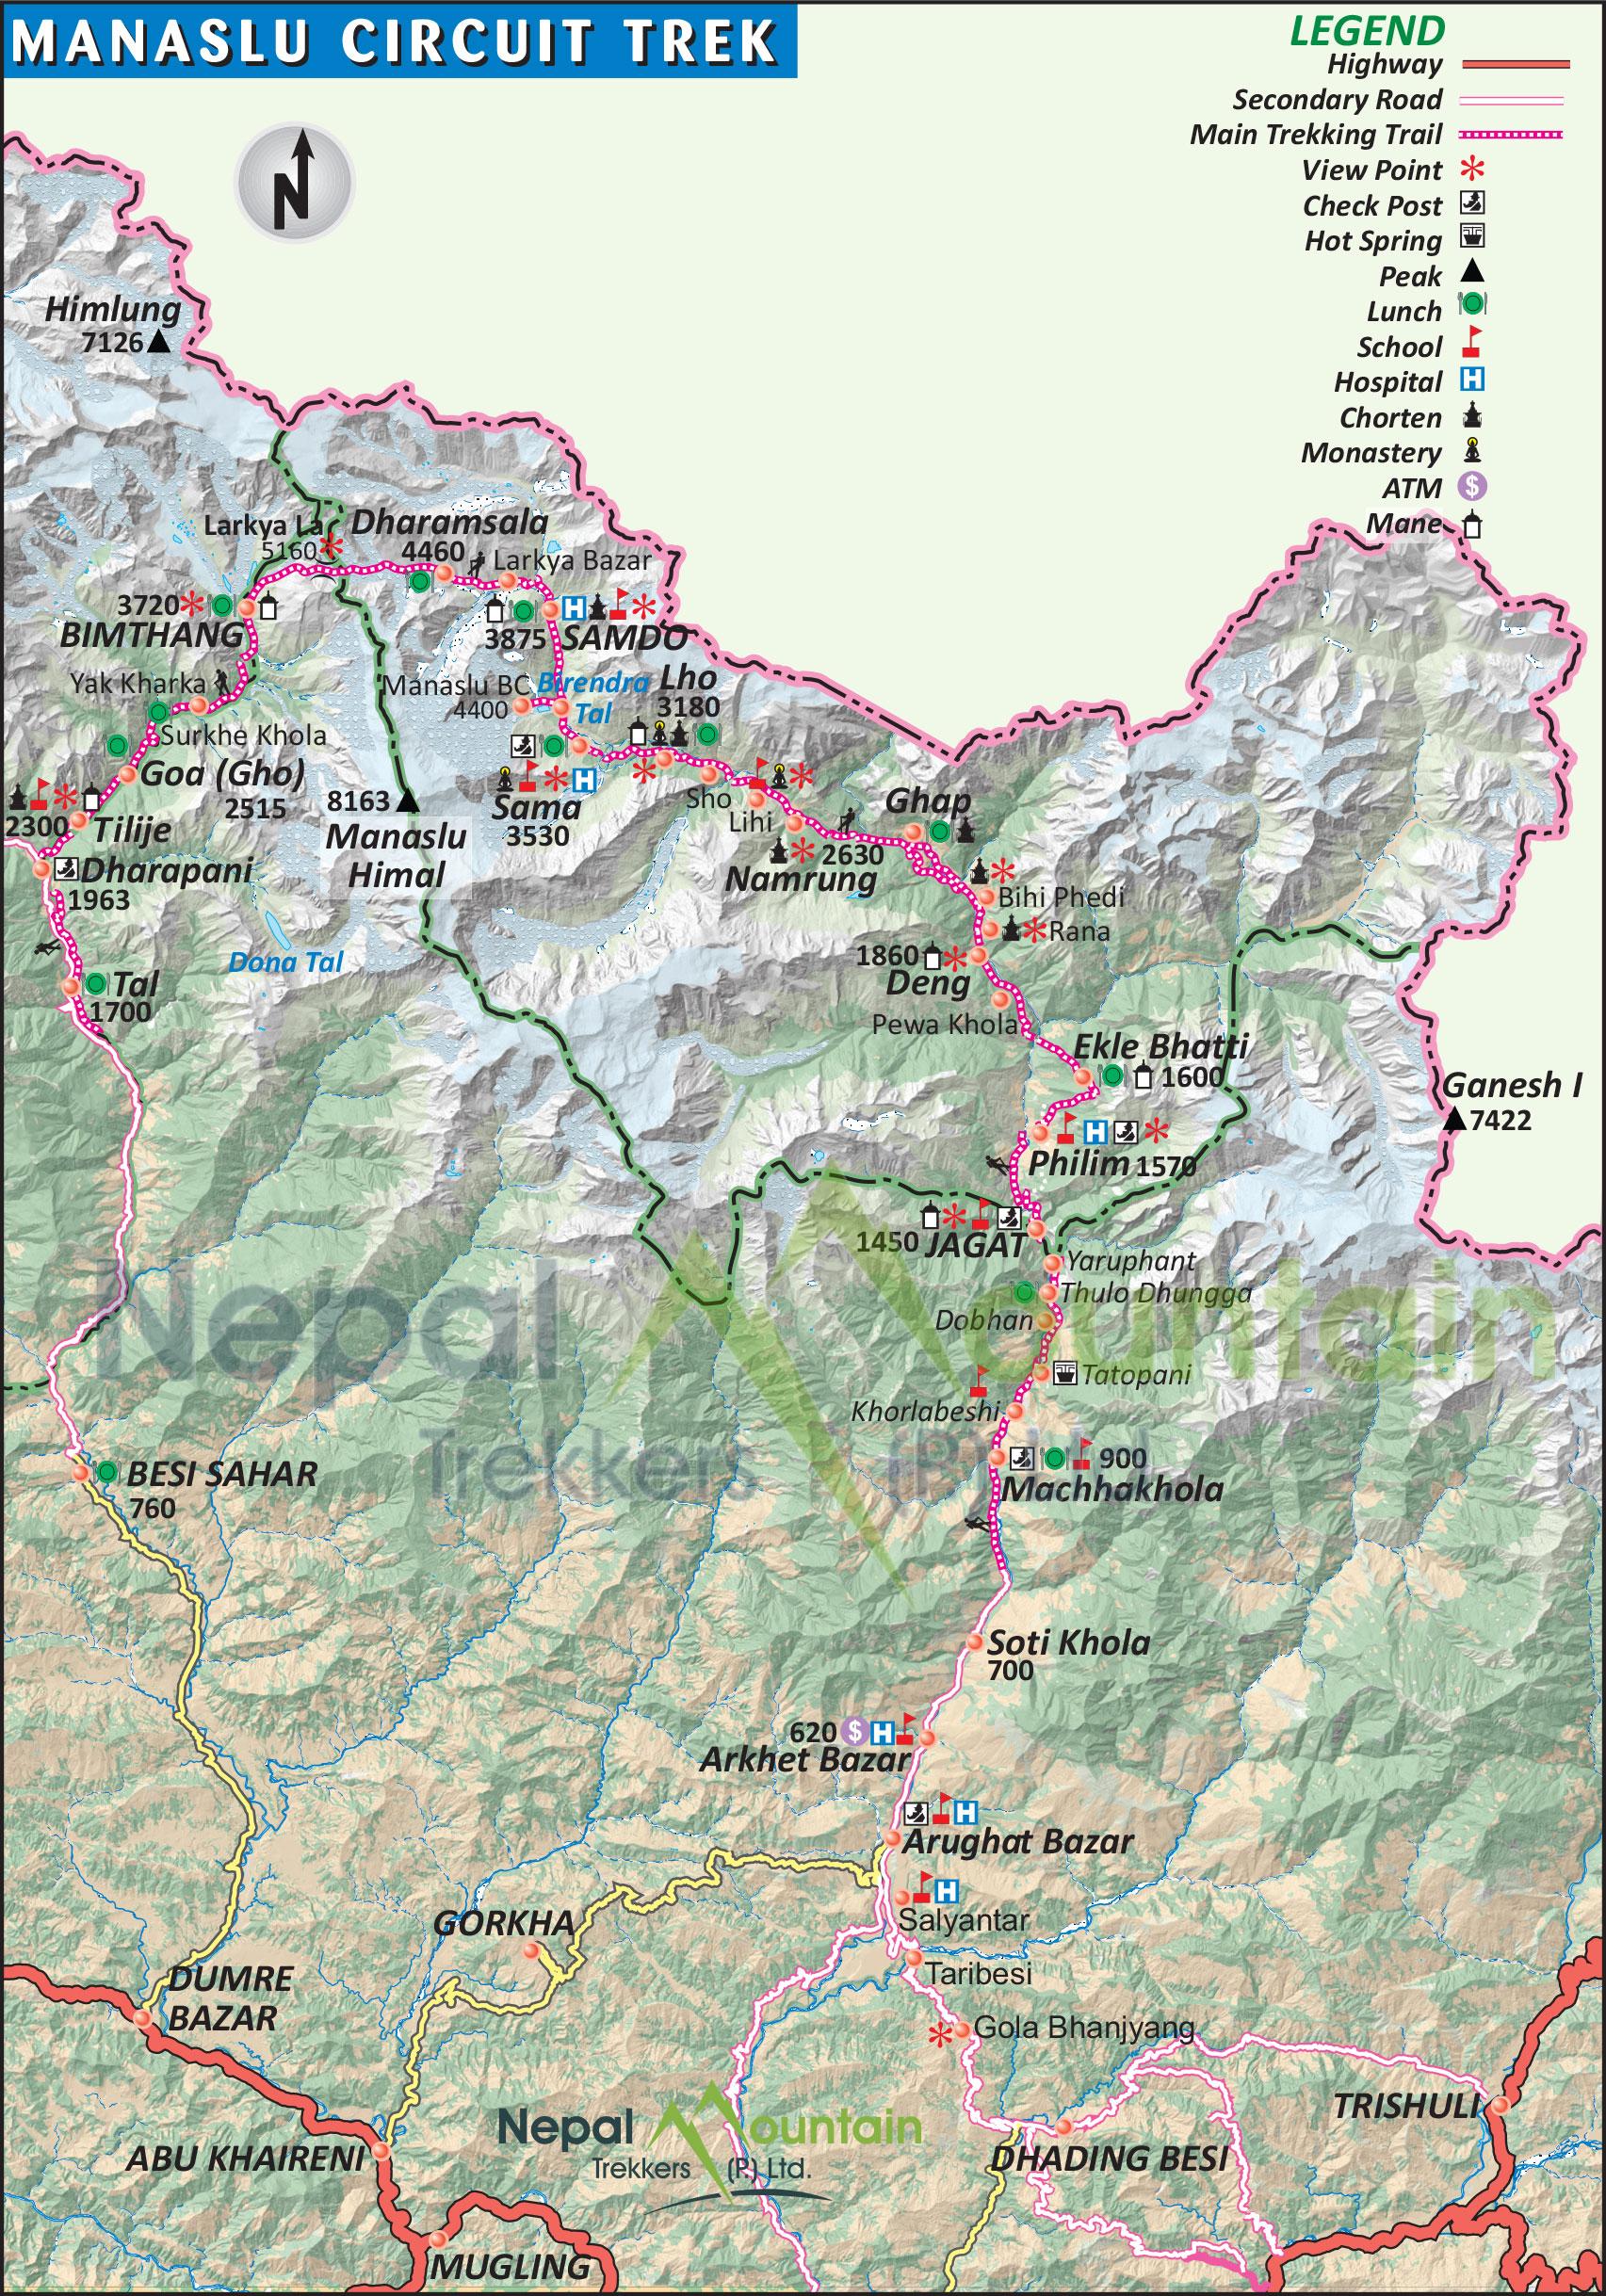 map of Manaslu Circuit Trek